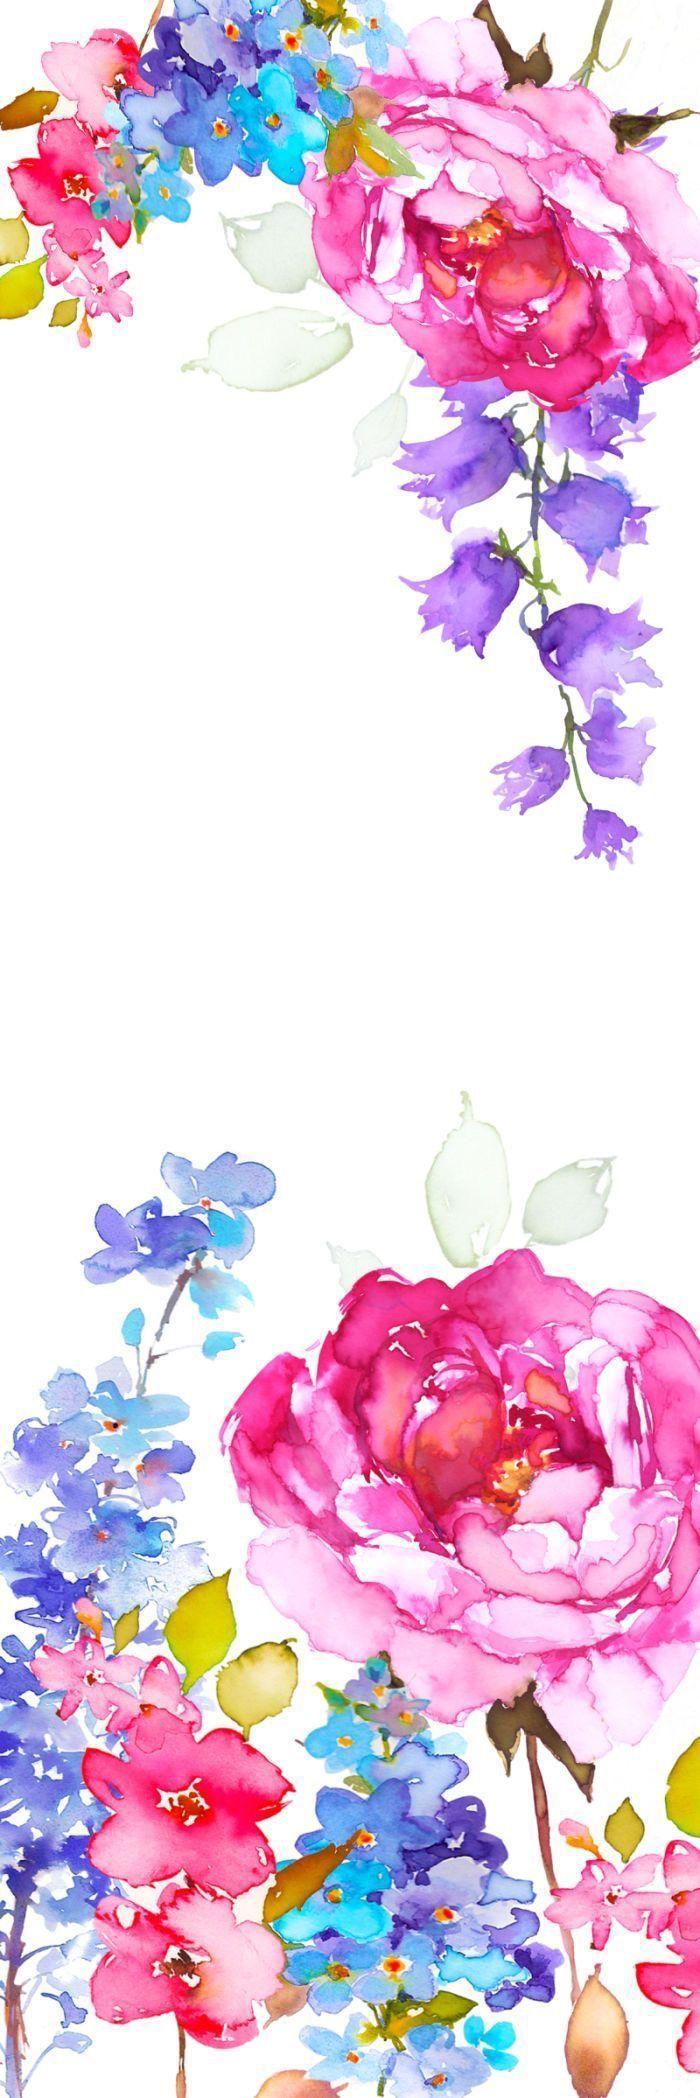 Watercolor Flower Iphone Wallpapers Top Free Watercolor Flower Iphone Backgrounds Wallpaperaccess